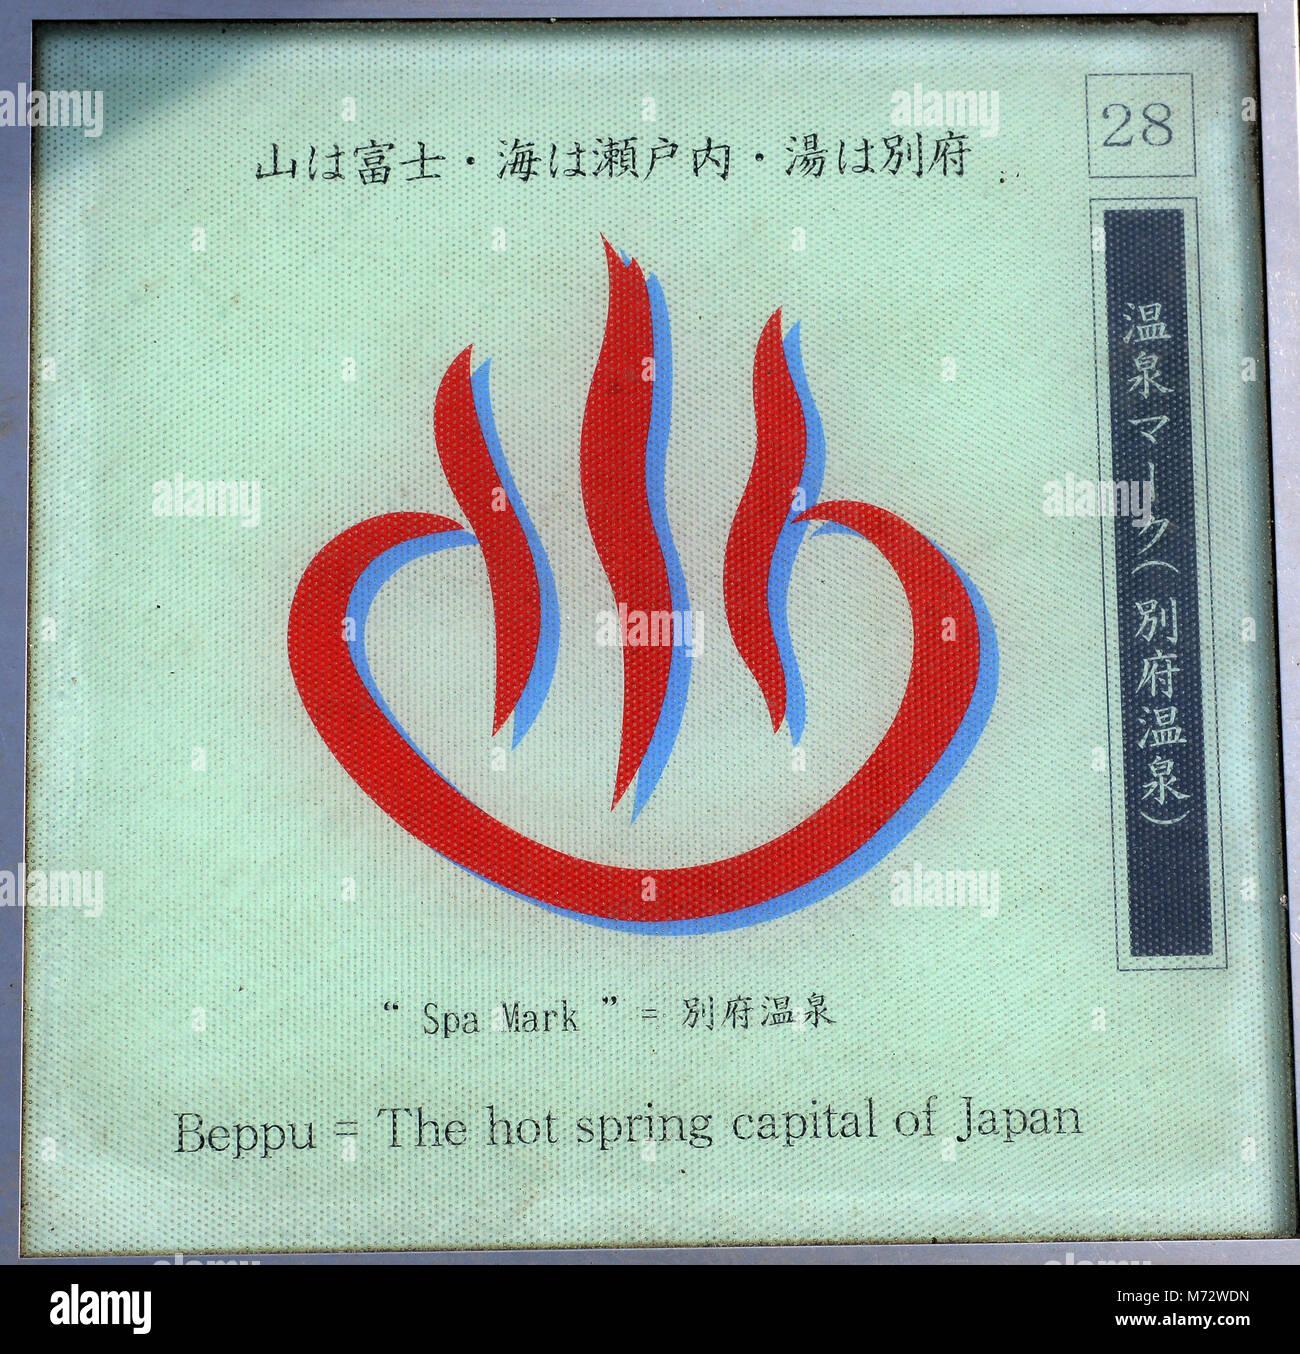 Beppu - The hot spring capital of Japan. - Stock Image